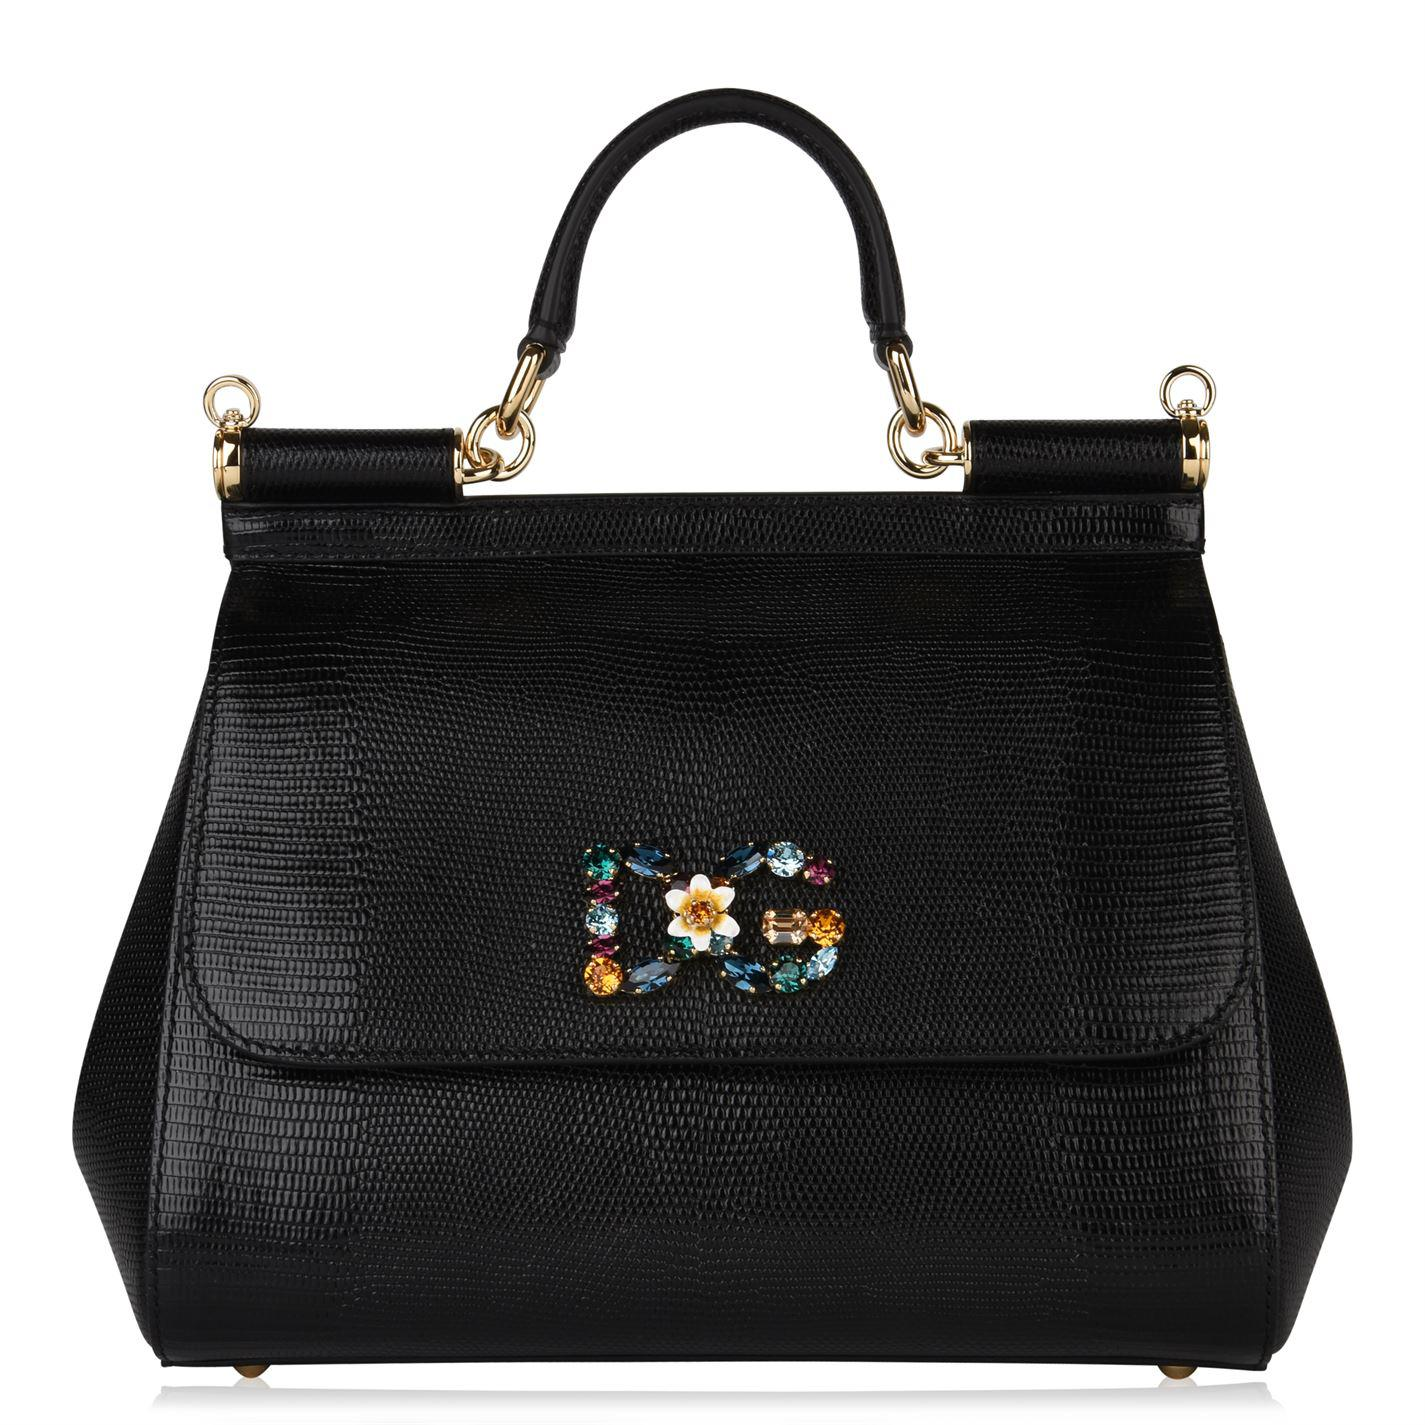 Lyst - Dolce   Gabbana Sicily Medium Bag in Black 7e330d1980c